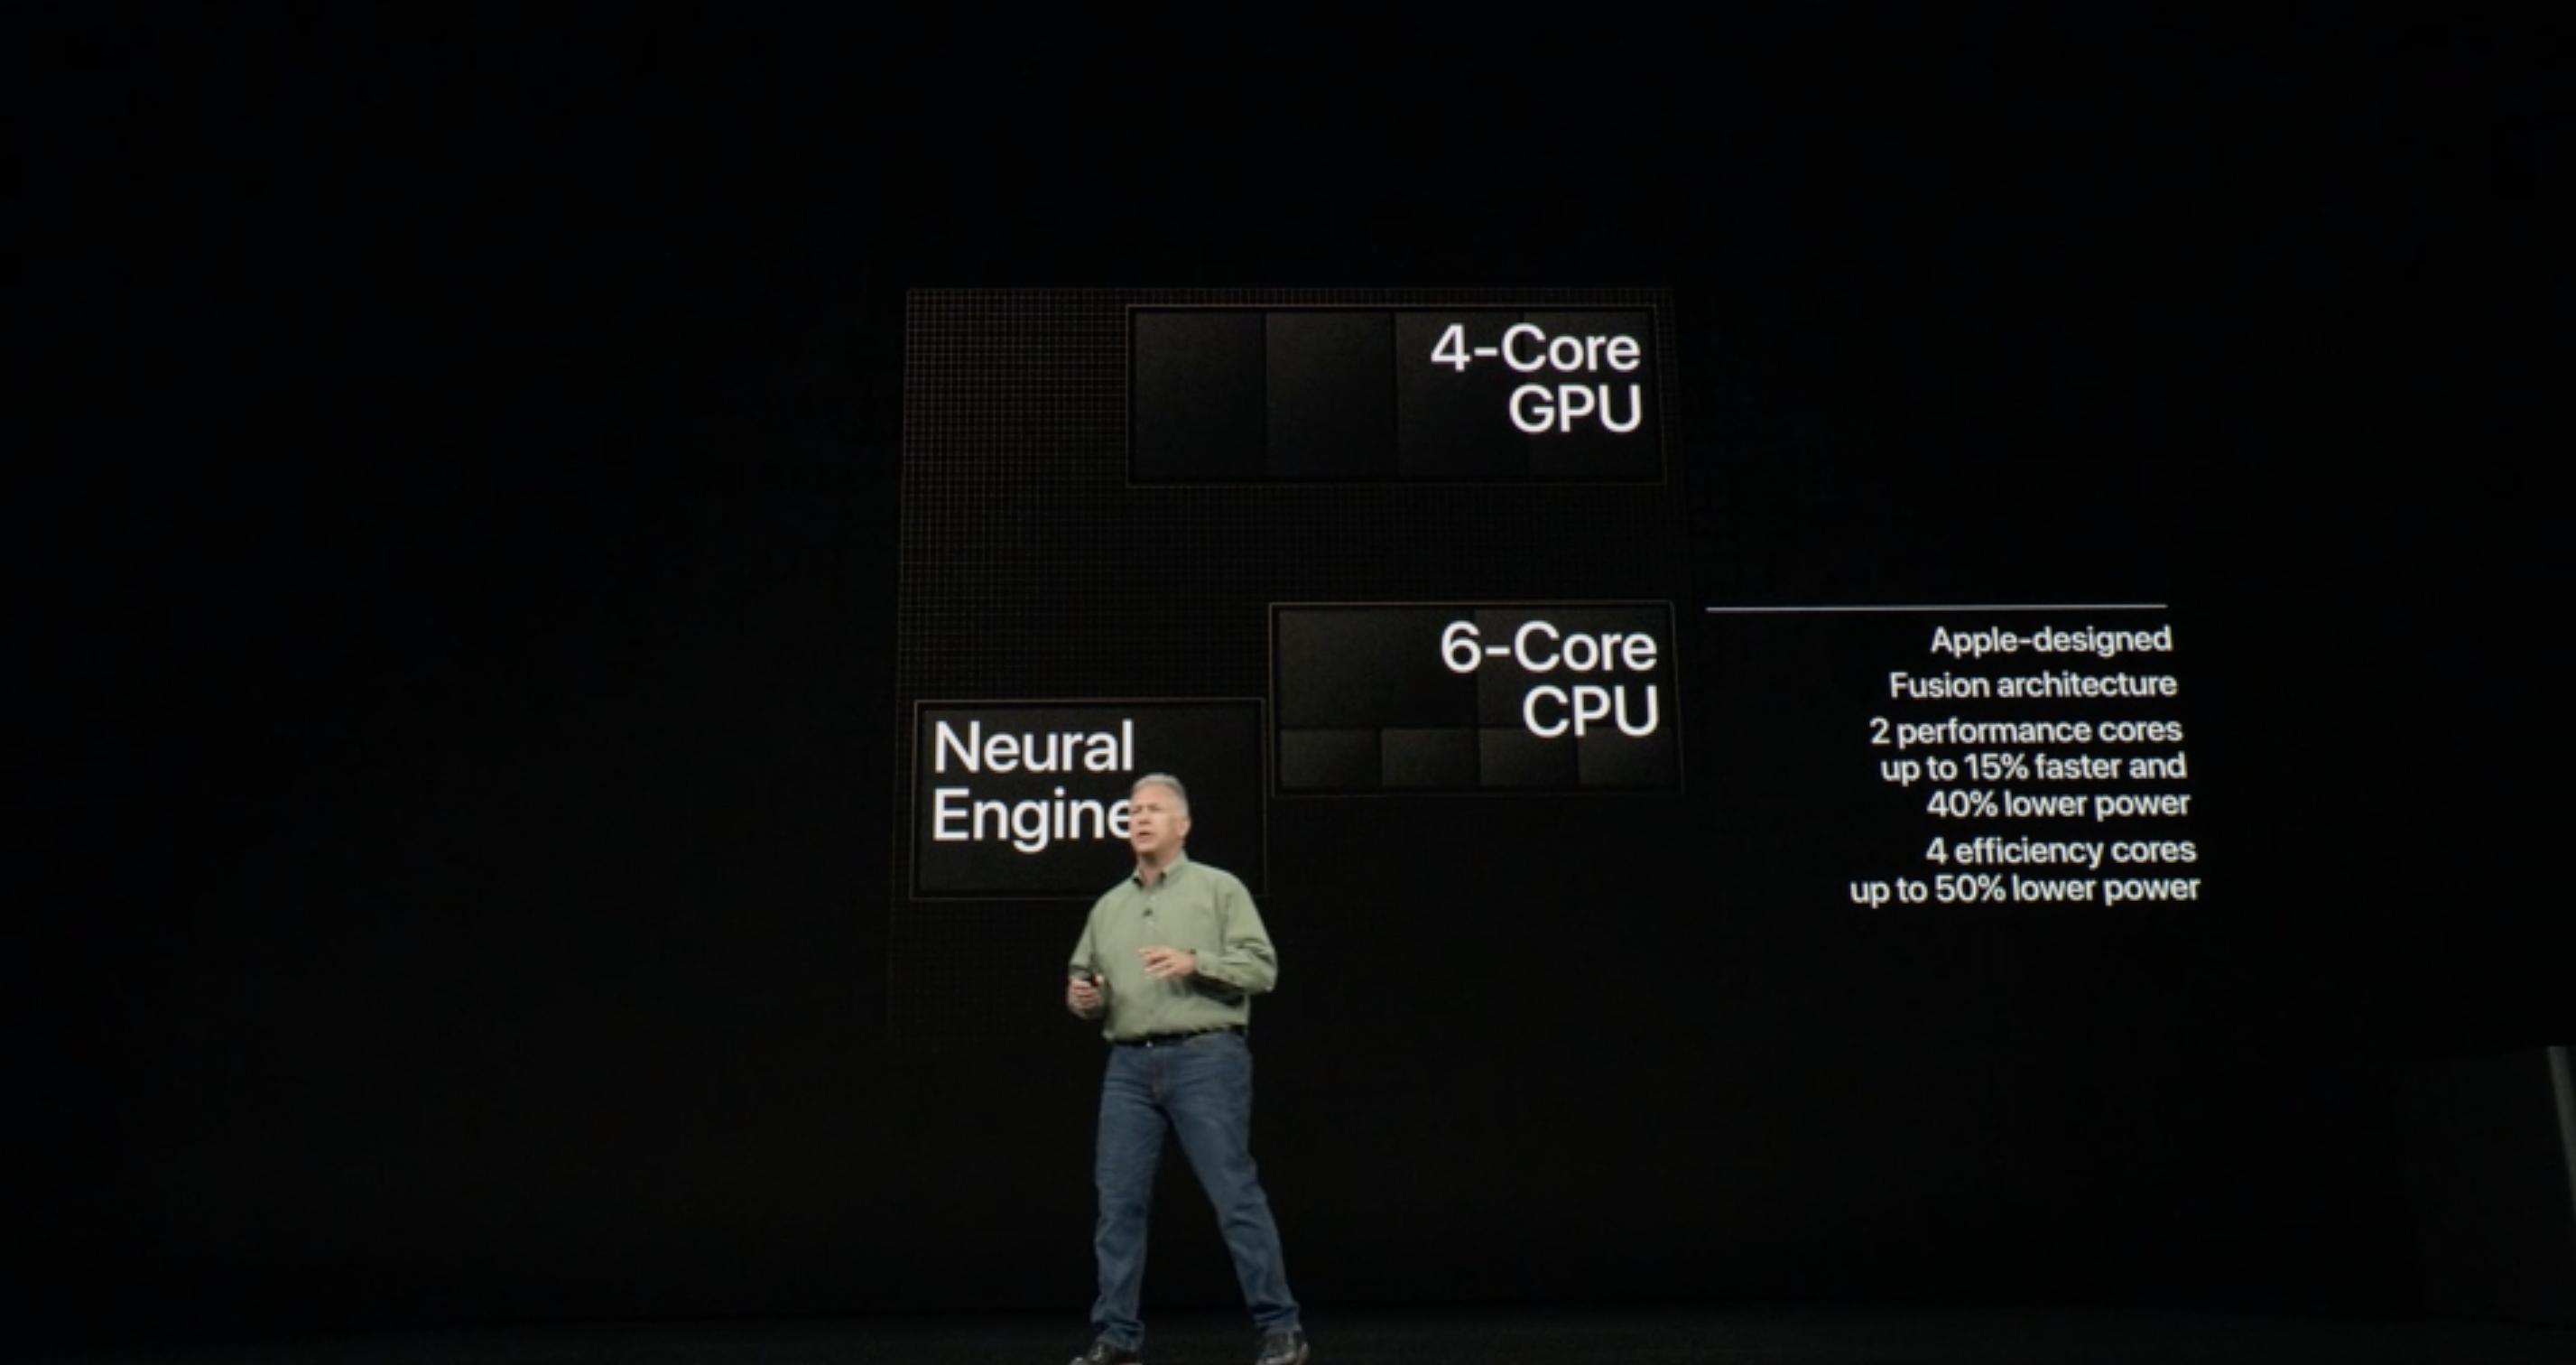 Apple A12 Bionic: 7 Billion Transistors, 5 TOPS Neural